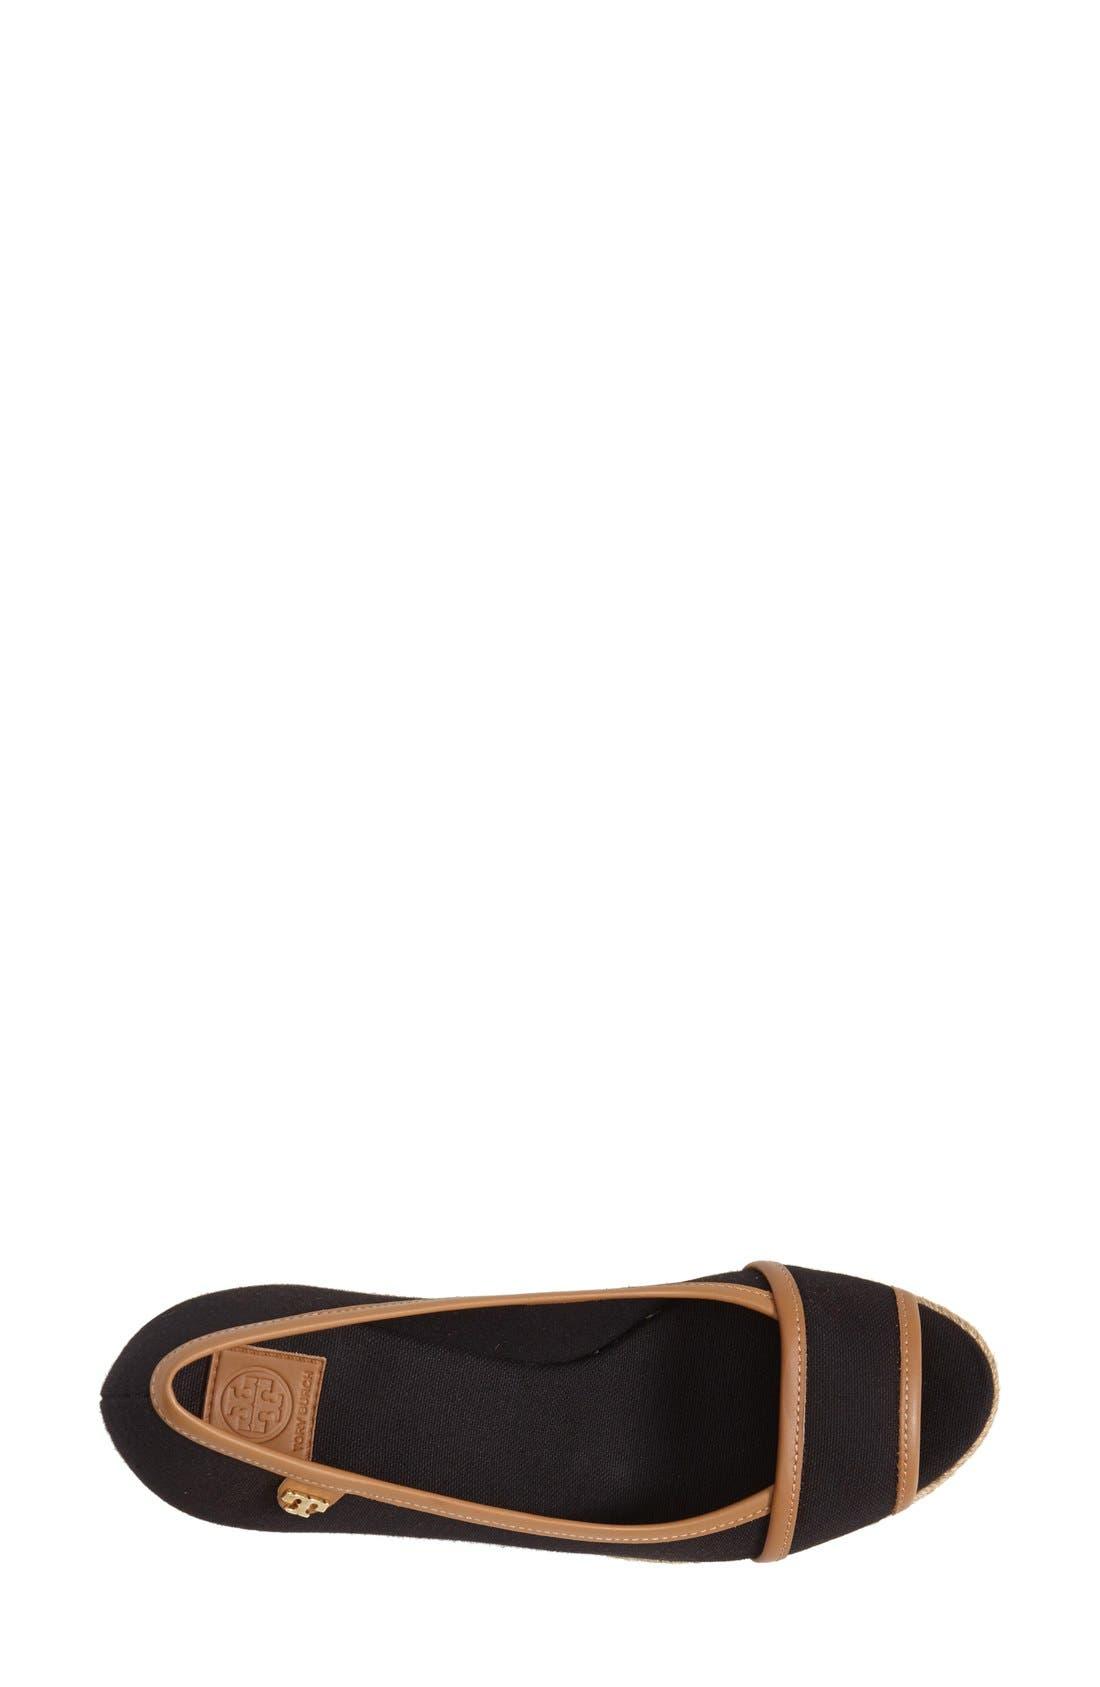 TORY BURCH,                             'Majorca' Wedge Sandal,                             Alternate thumbnail 4, color,                             013